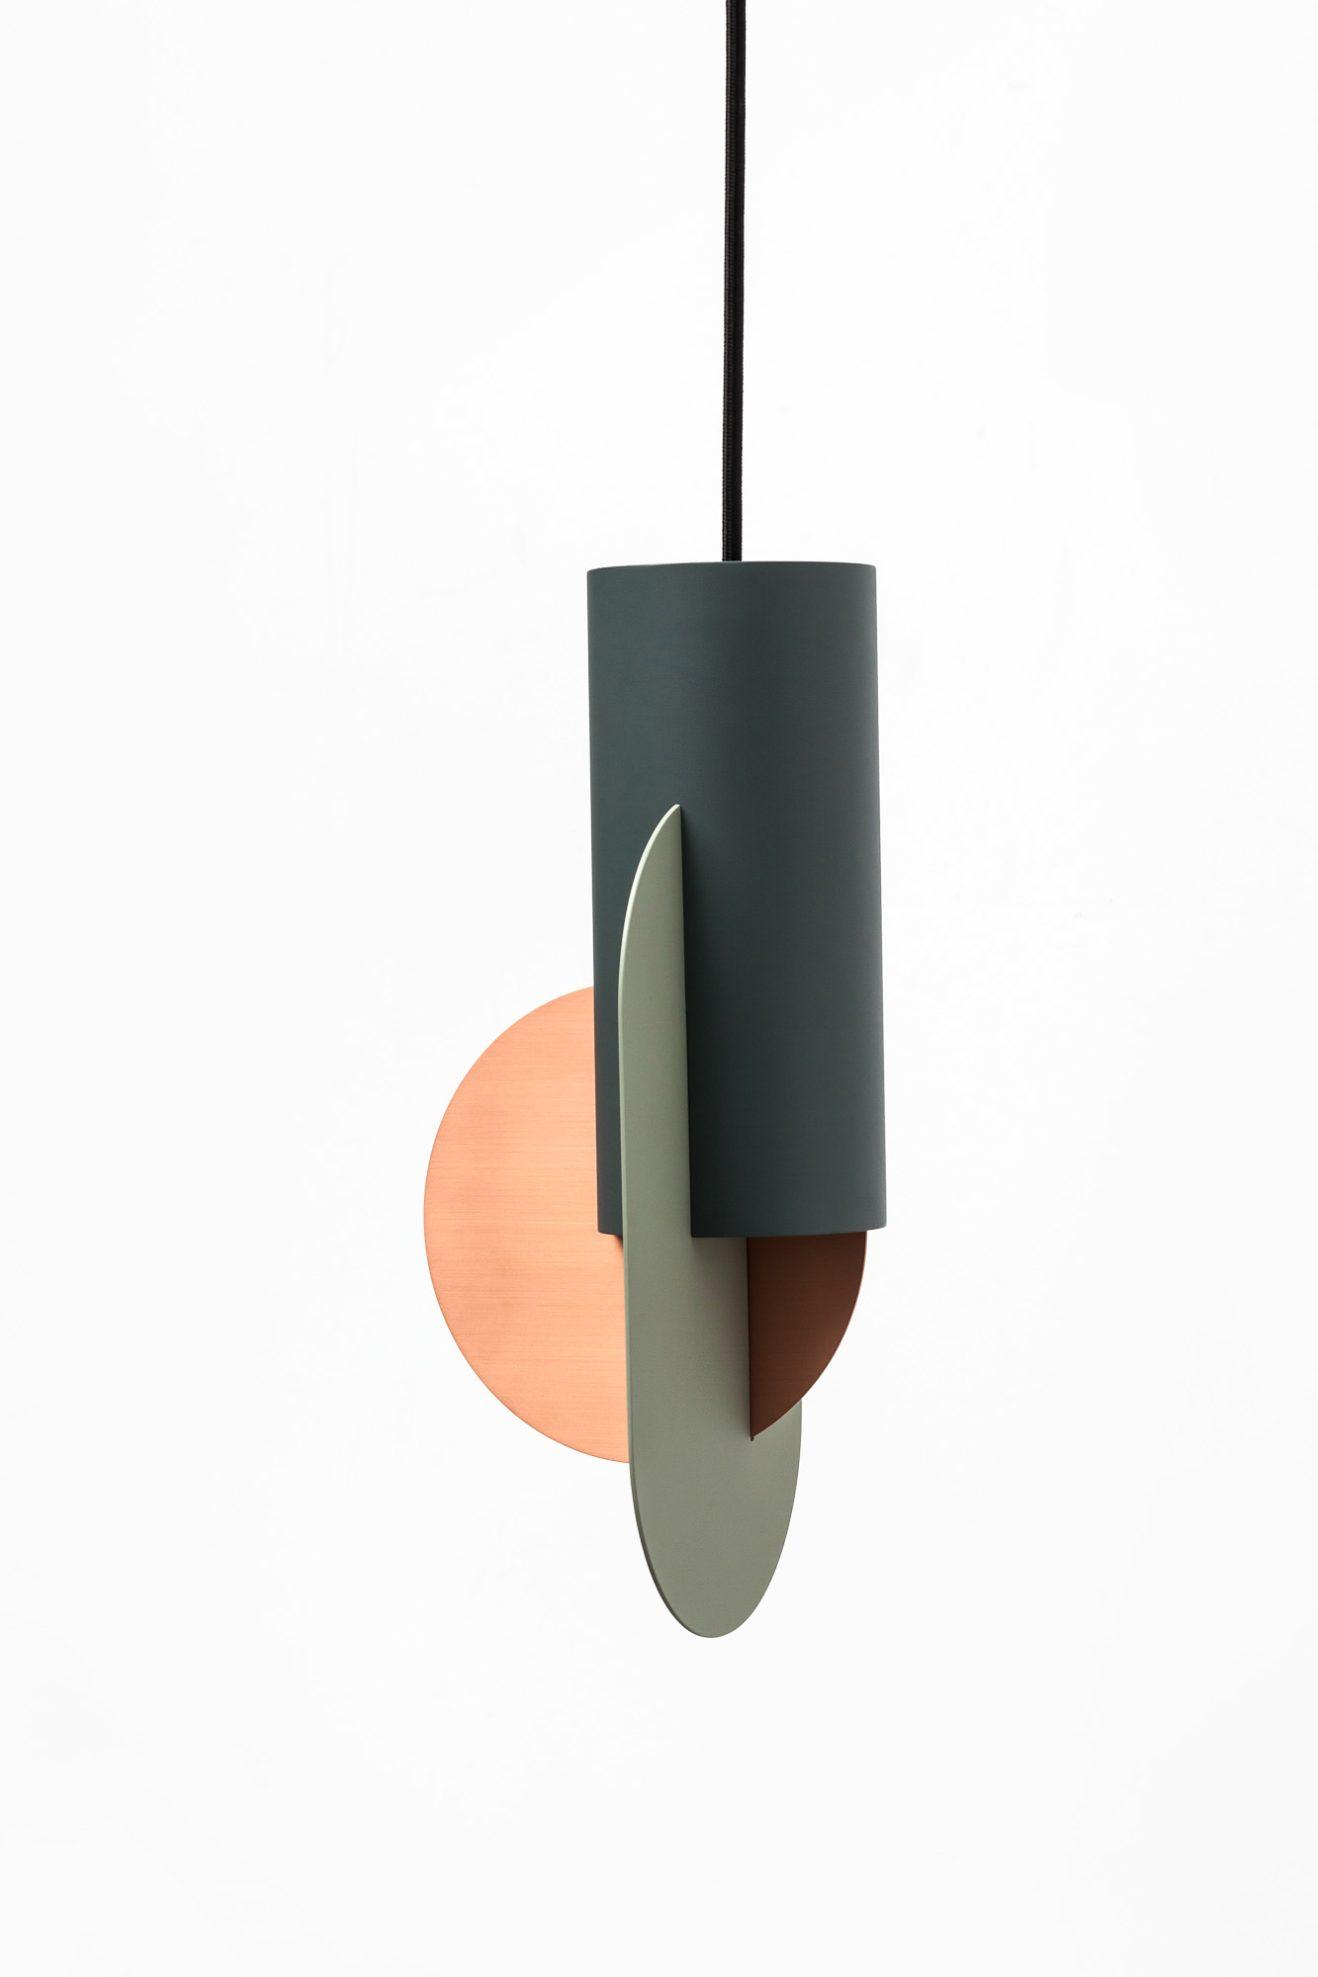 Noom-Suprematic-Lamp-CS1-4